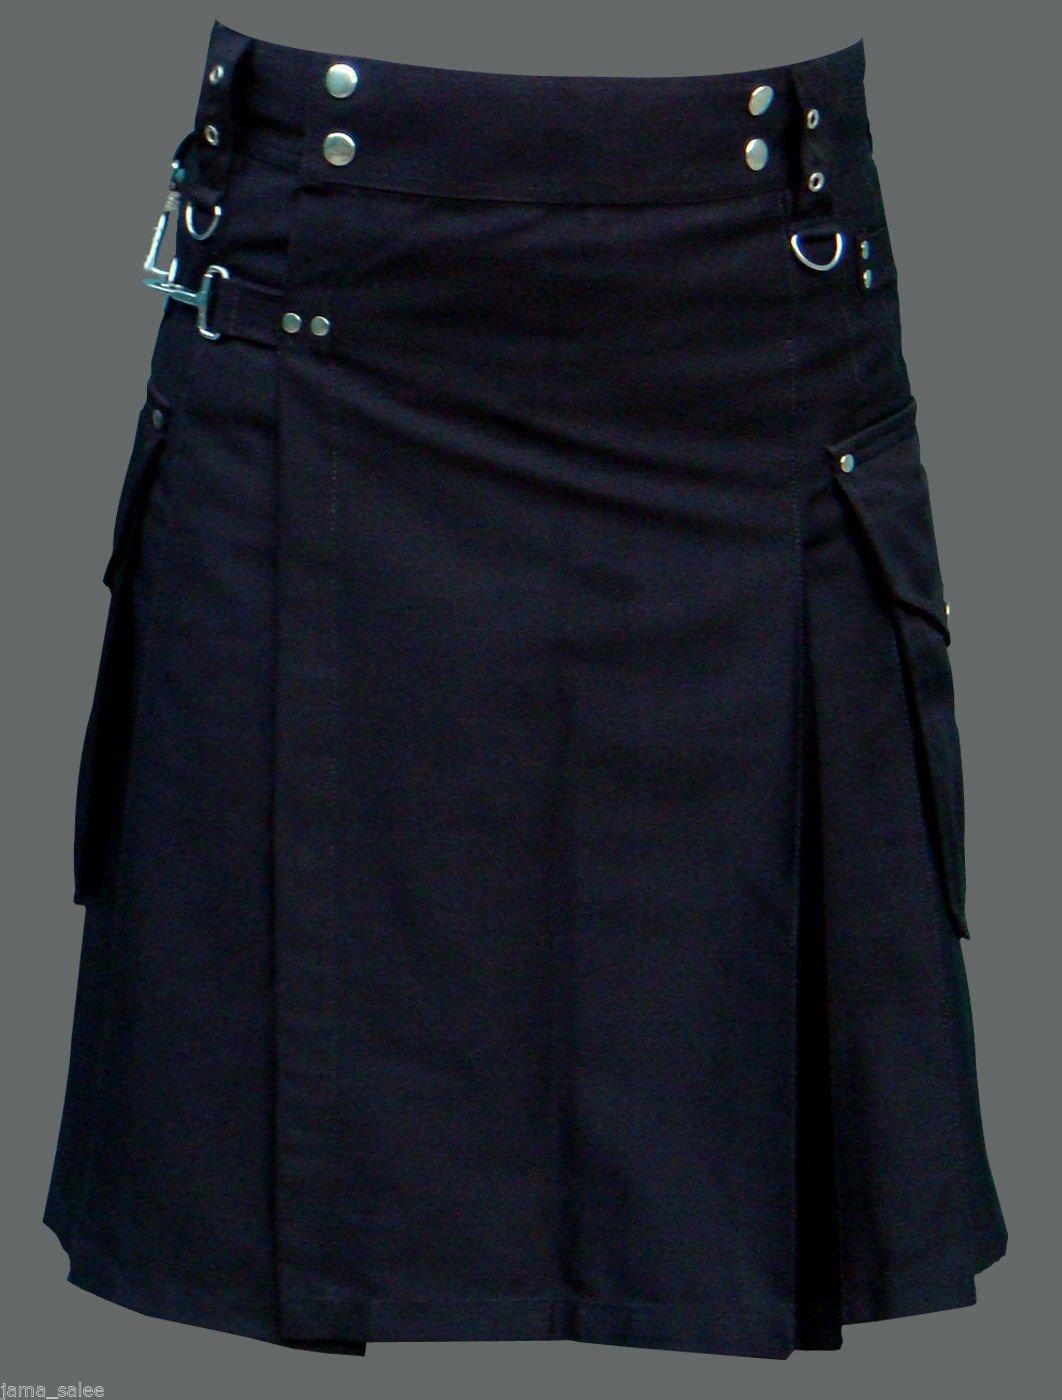 Men 50 Waist Handmade Black Deluxe Utility Kilt 100% Cotton With Cargo Pockets